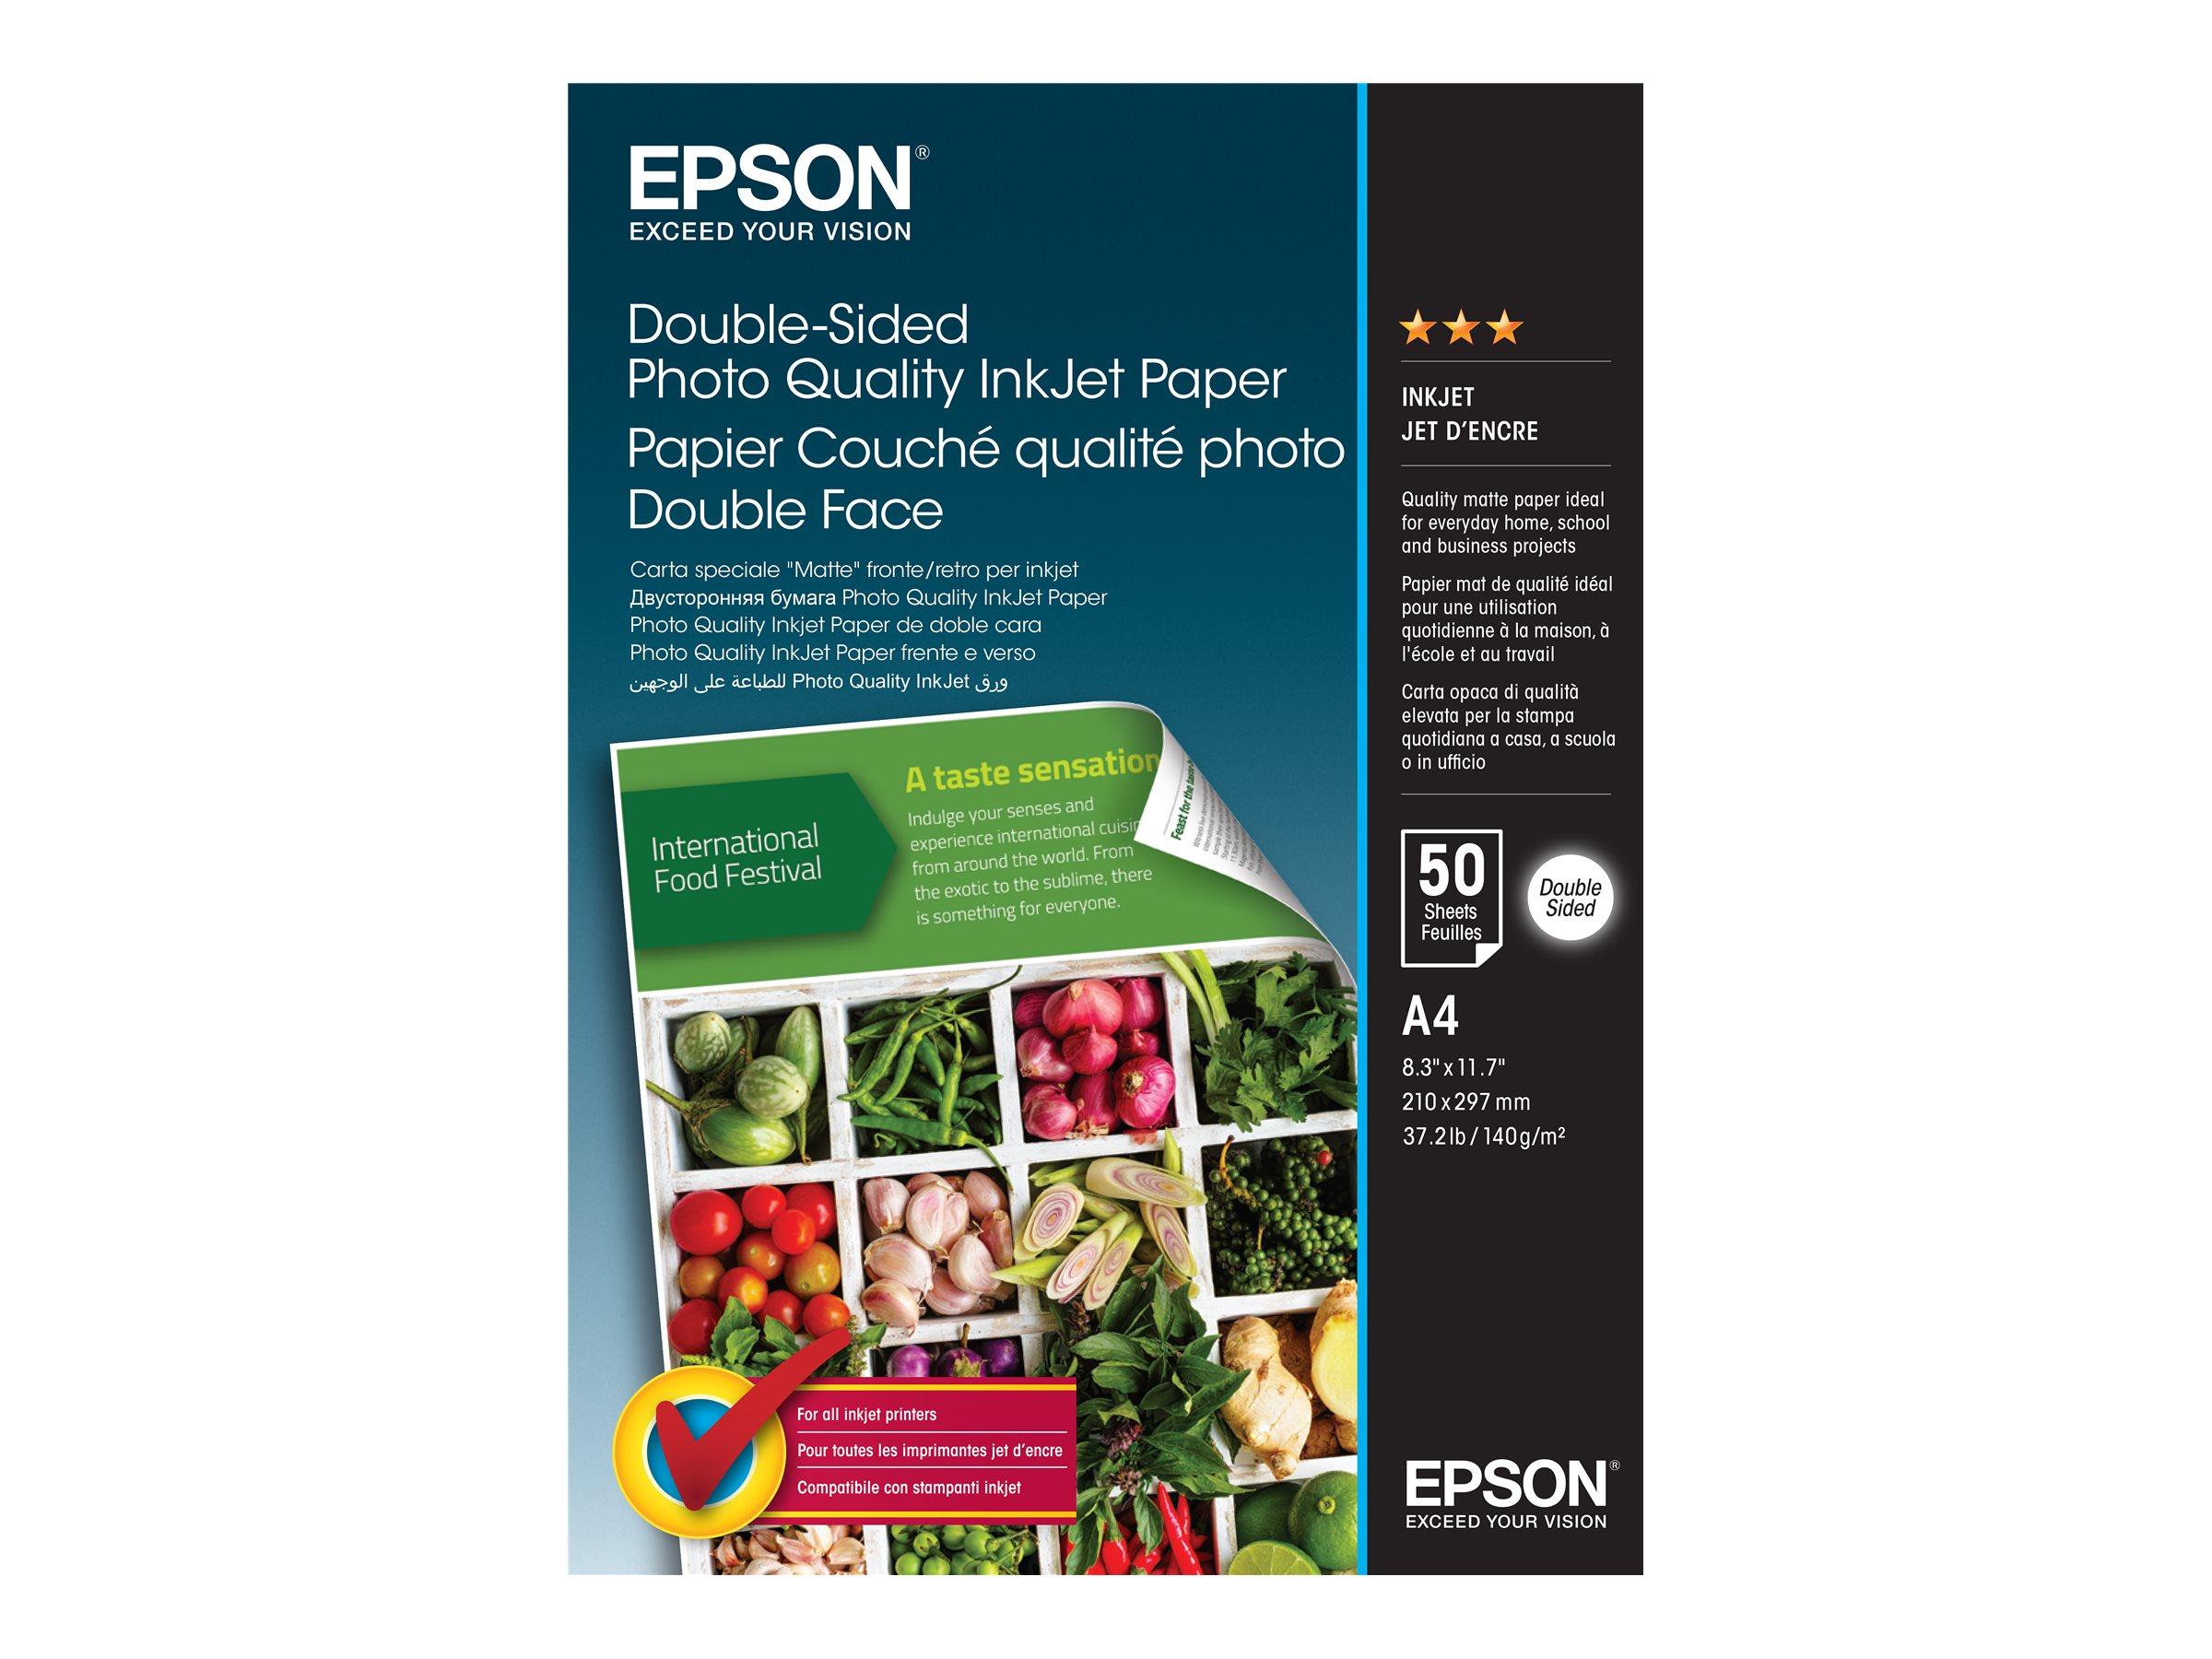 Epson Double-Sided Photo Quality Inkjet Paper - Matt - A4 (210 x 297 mm) - 140 g/m² - 50 Blatt Fotopapier - für EcoTank ET-2650,